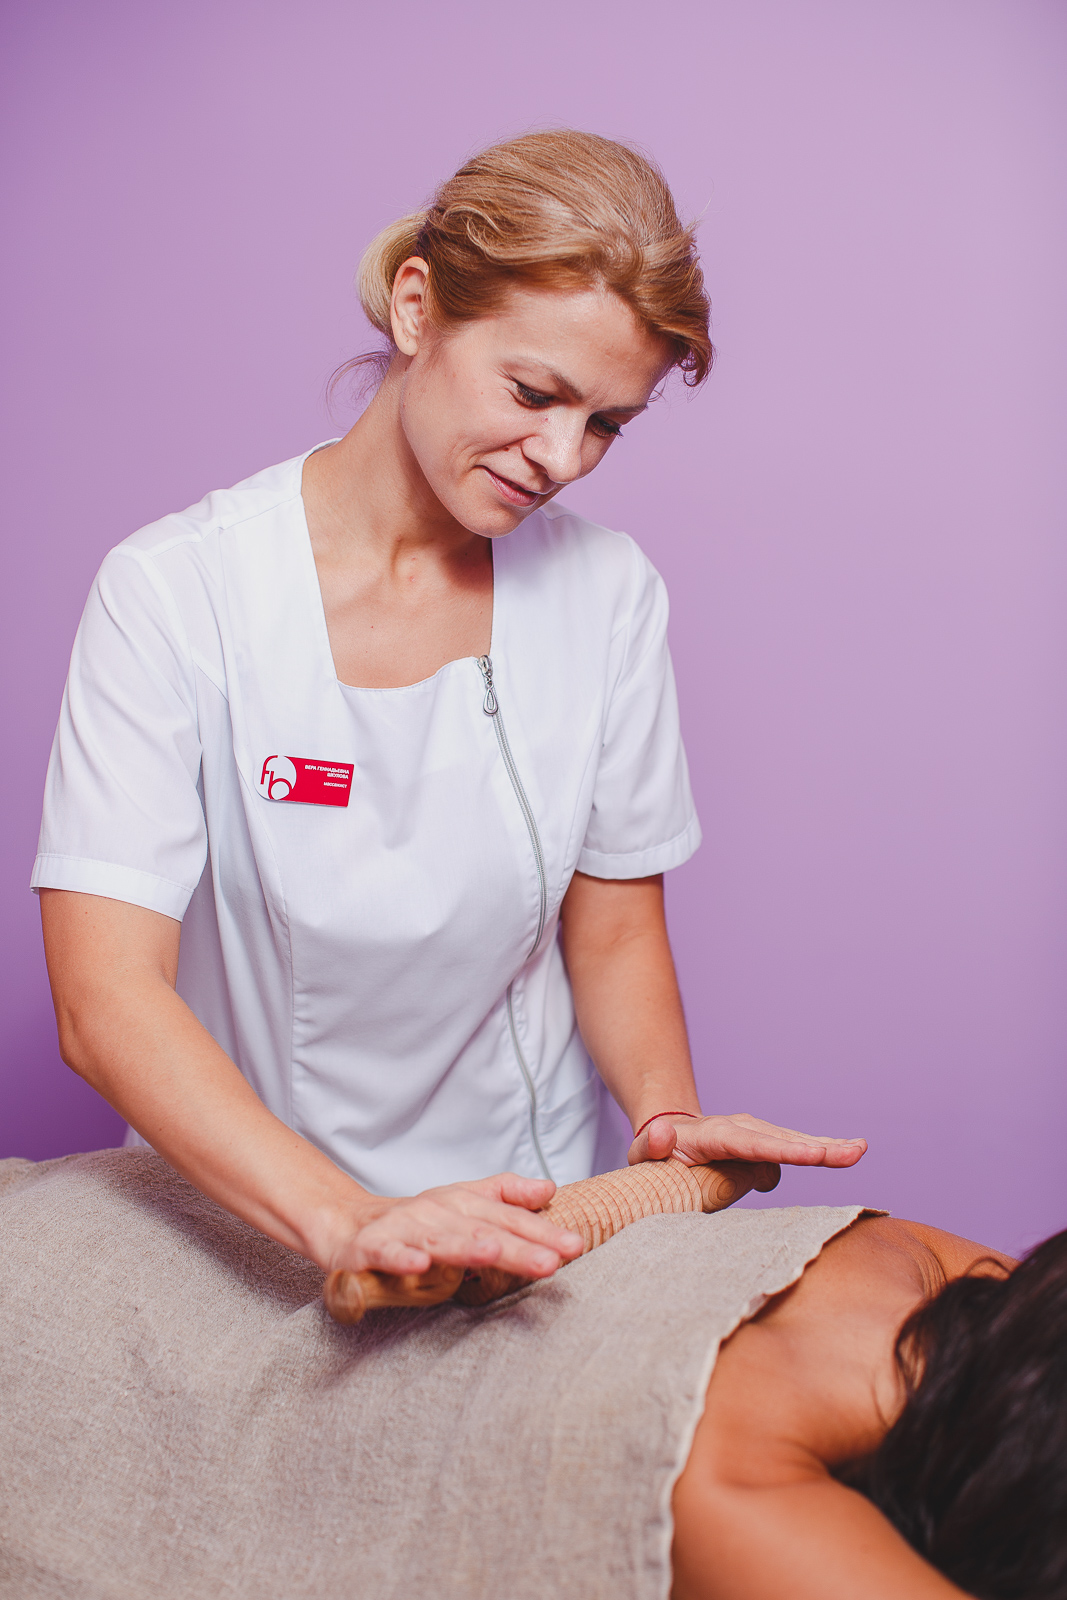 Лечебный массаж в Красноярске, цены на услуги